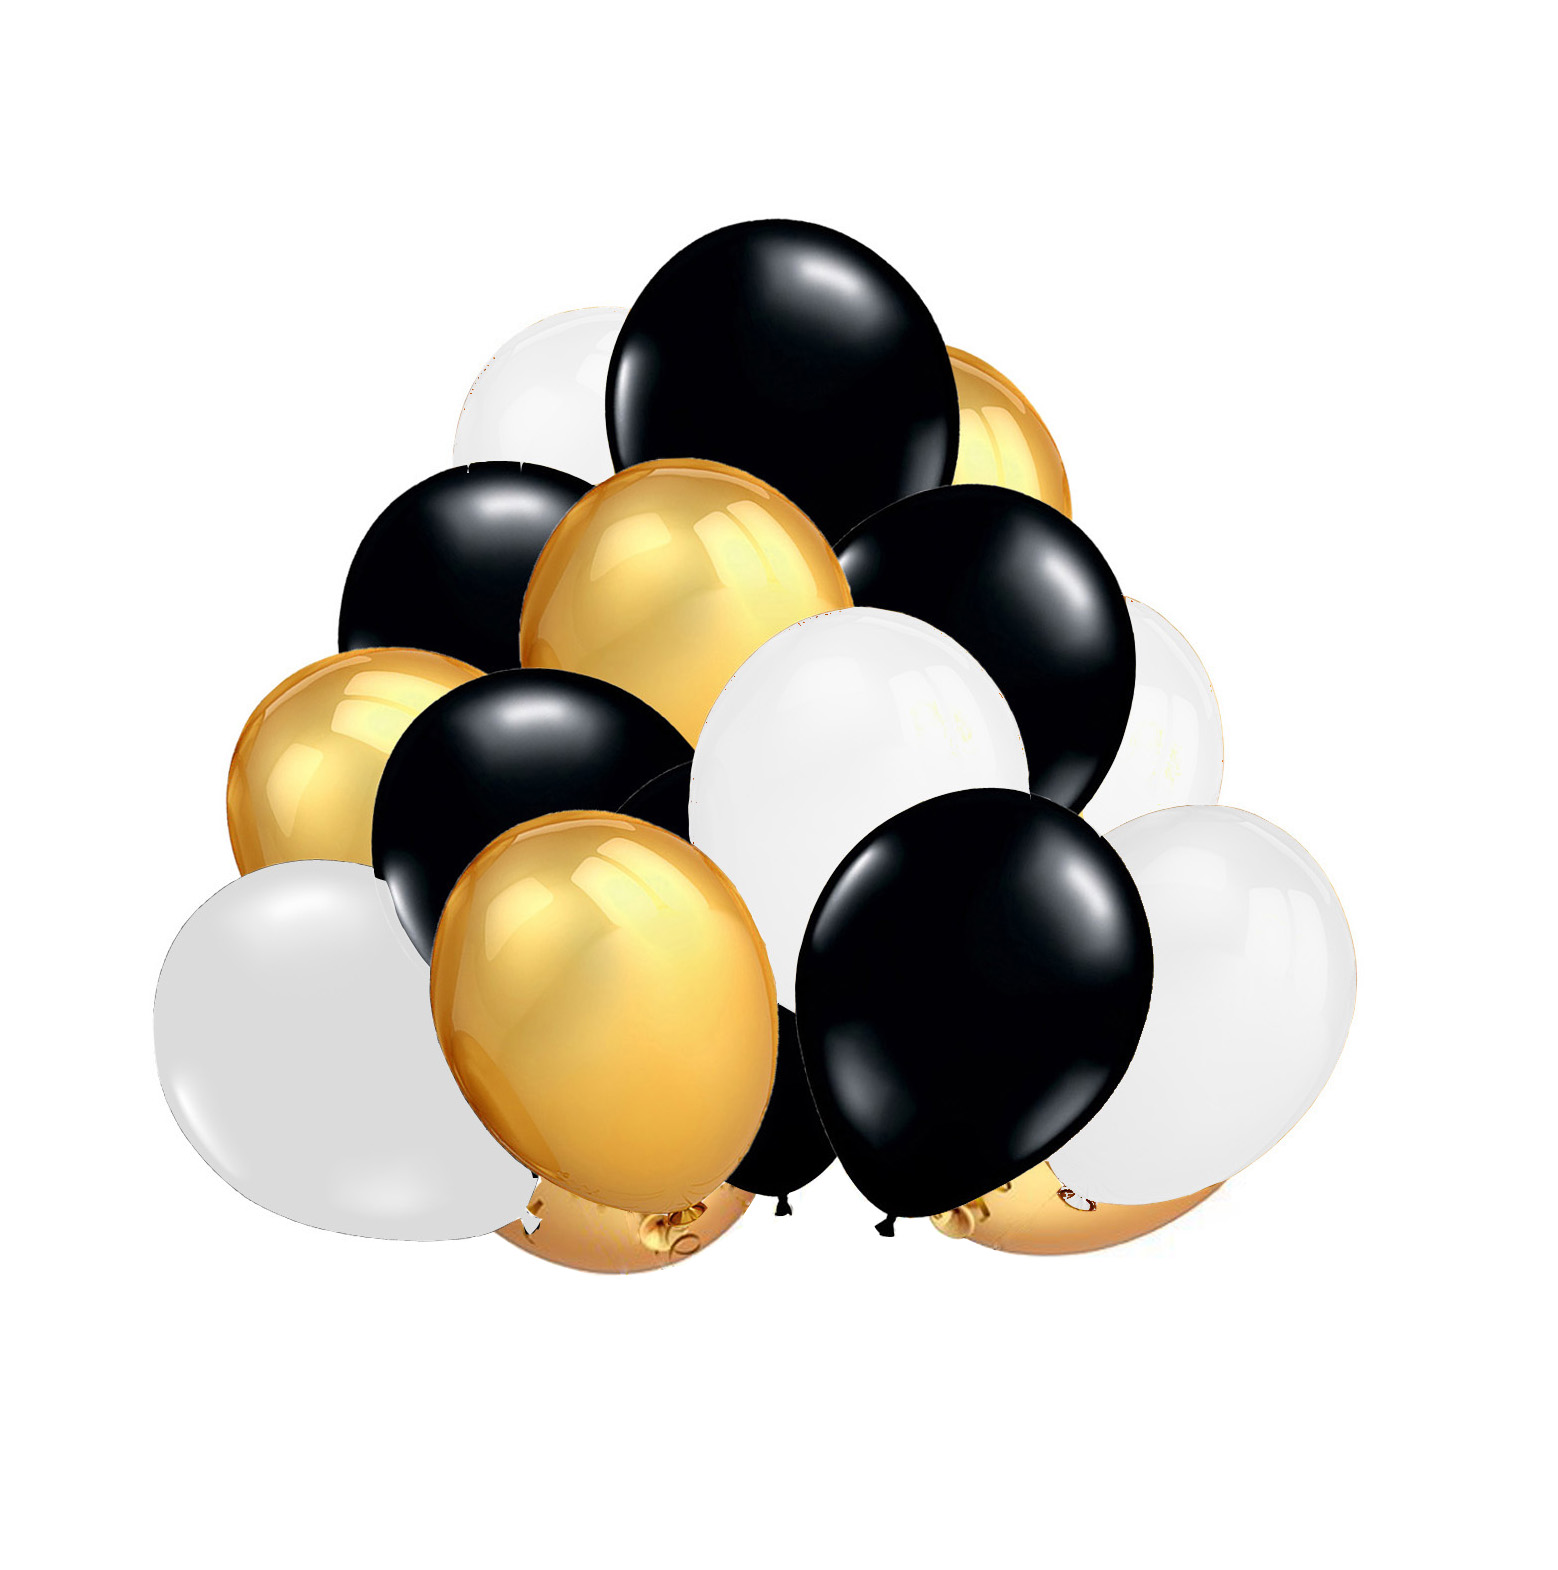 FECEDY Black Gold White Balloons.